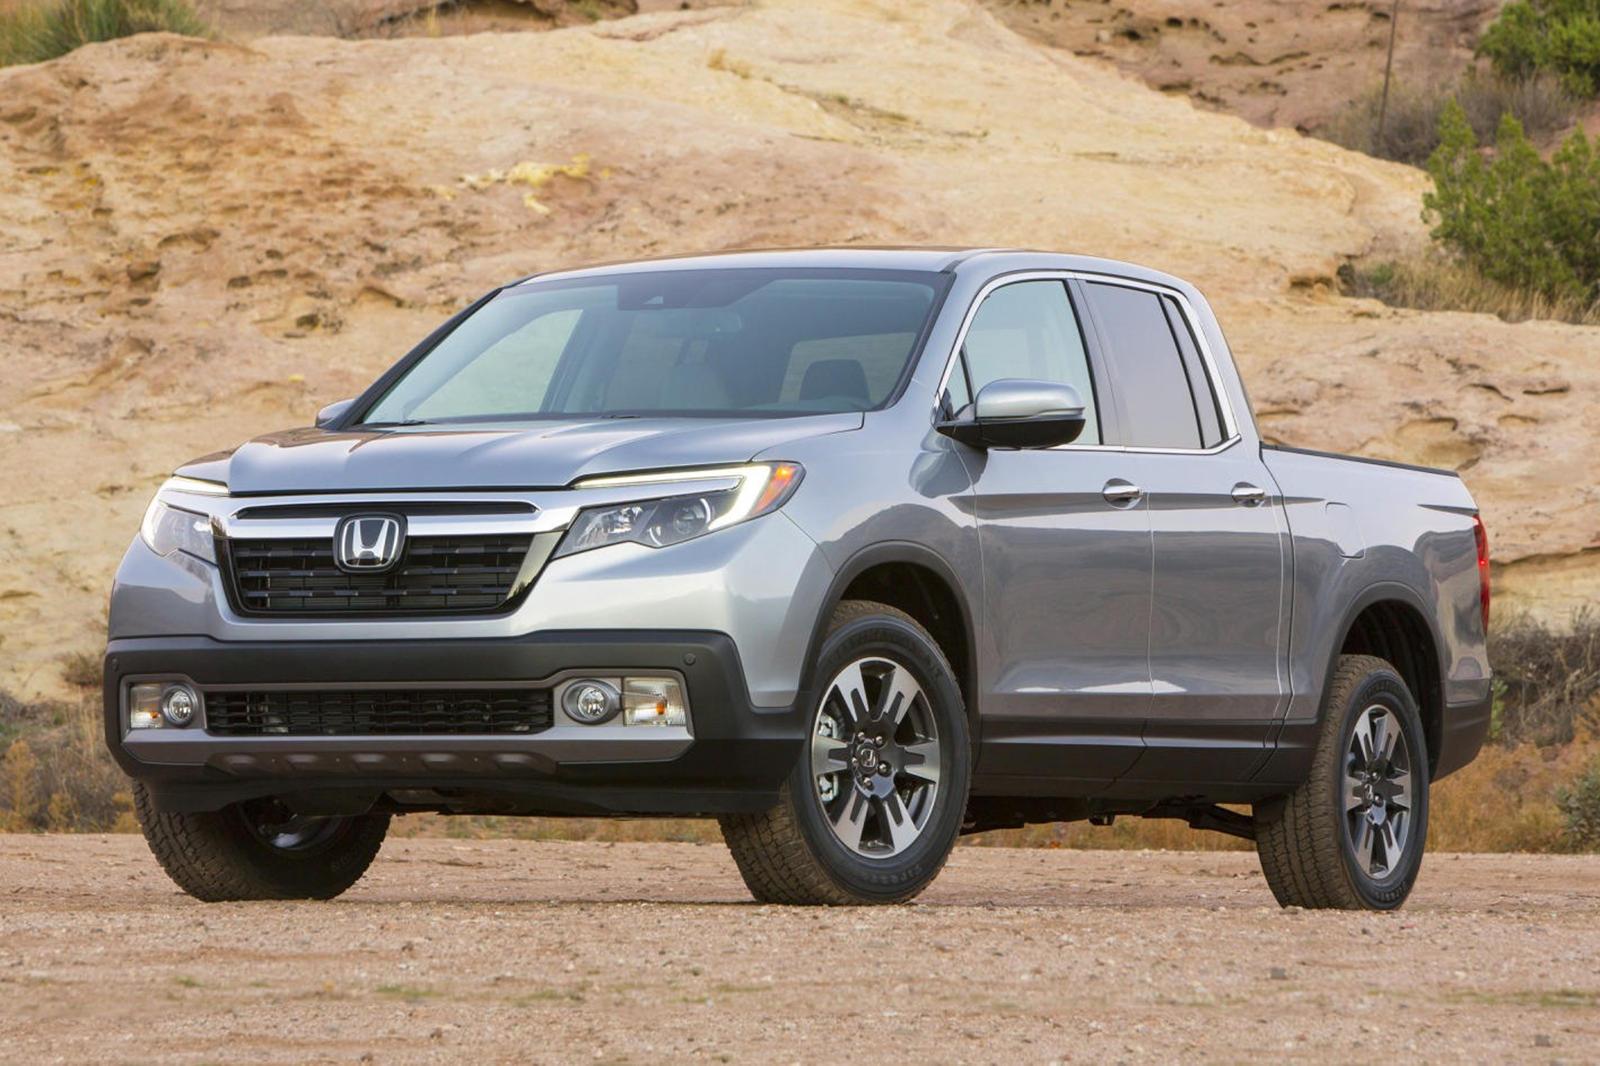 Honda Ridgeline 2020 1570700084141.jpg